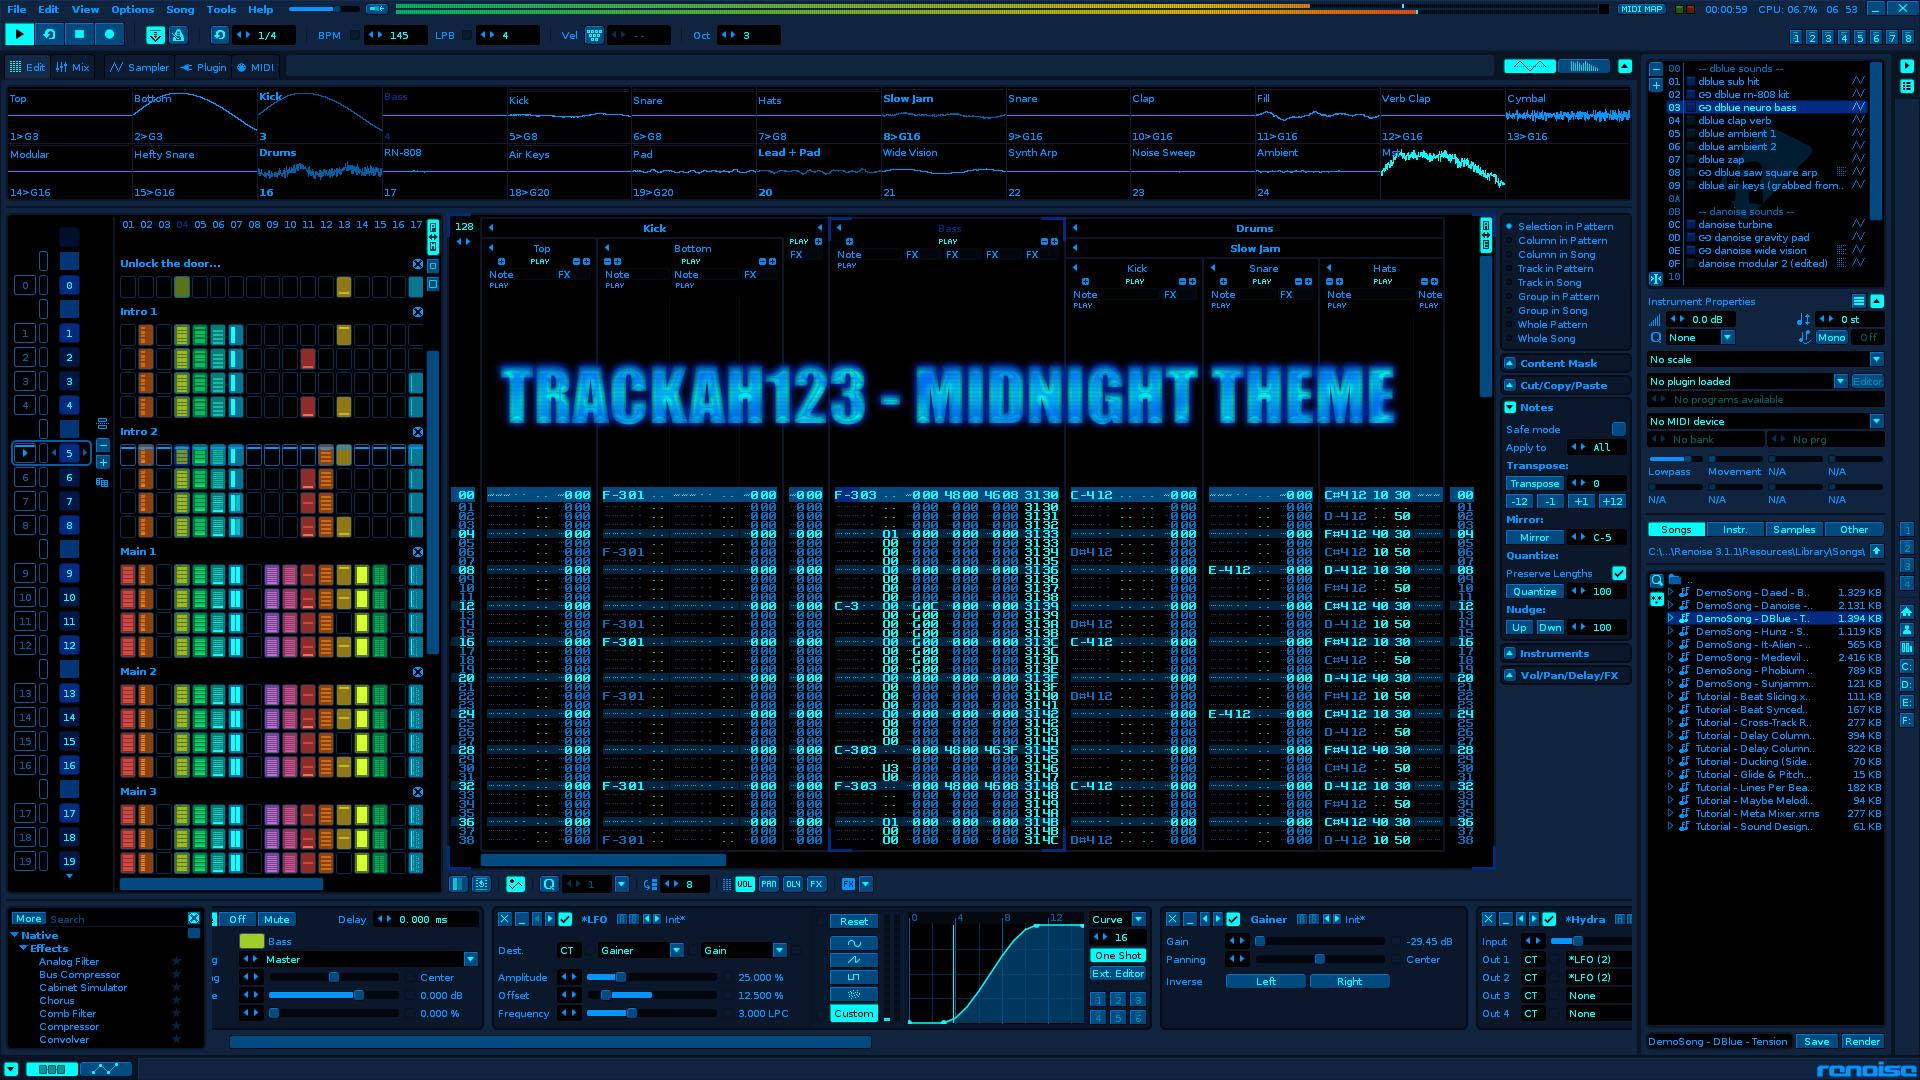 T123-Midnight